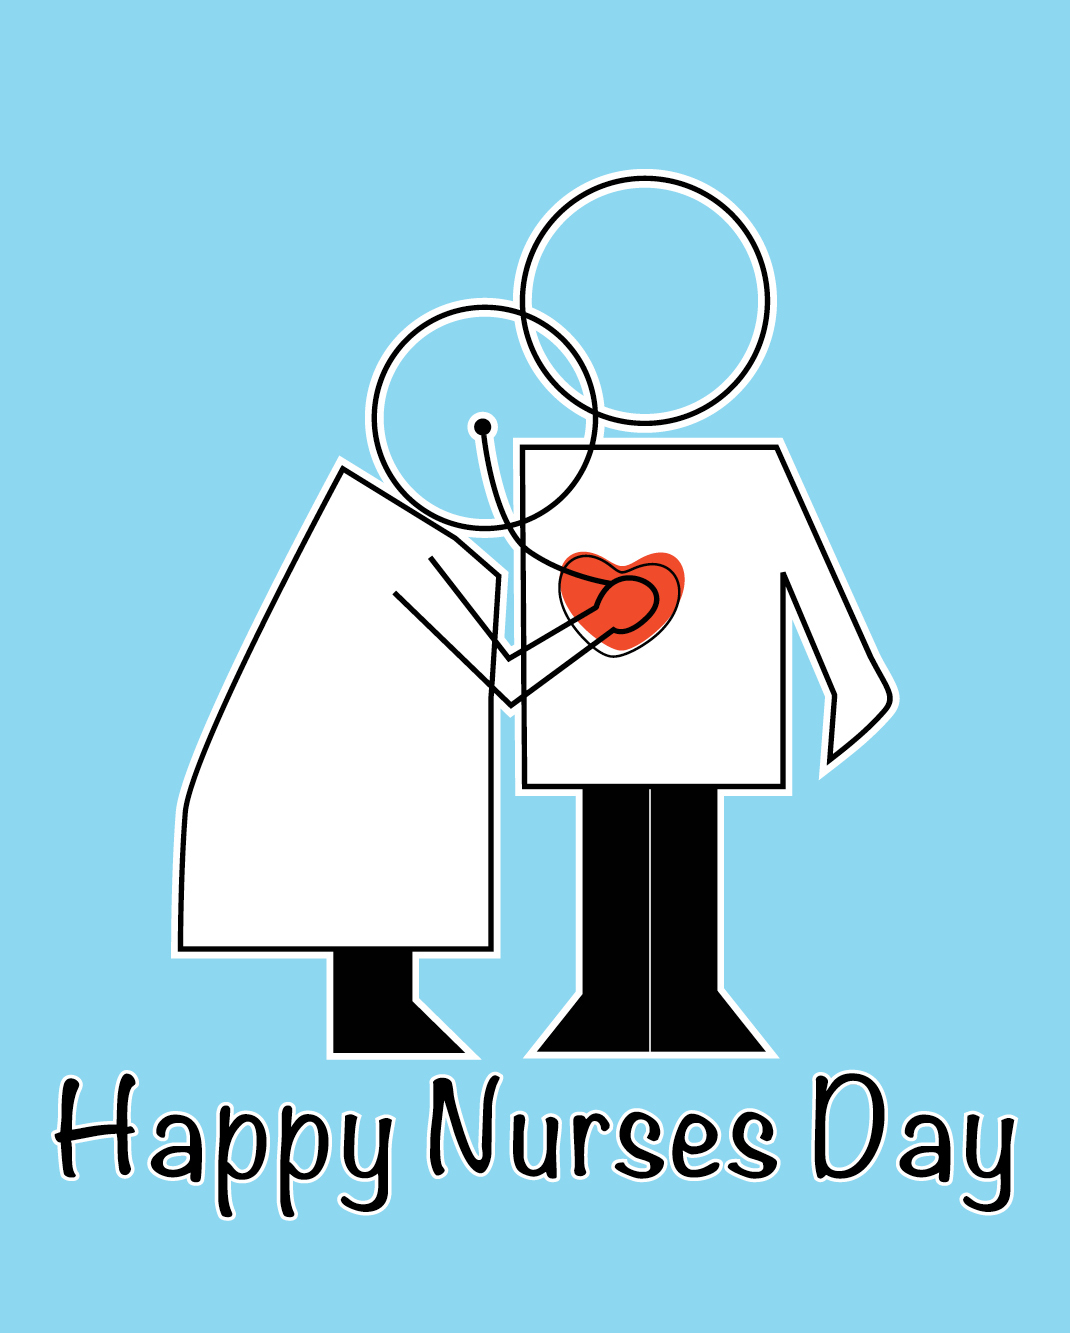 Happy Nurses Day   Pugsleyprints - Nurses Day Cards Free Printable